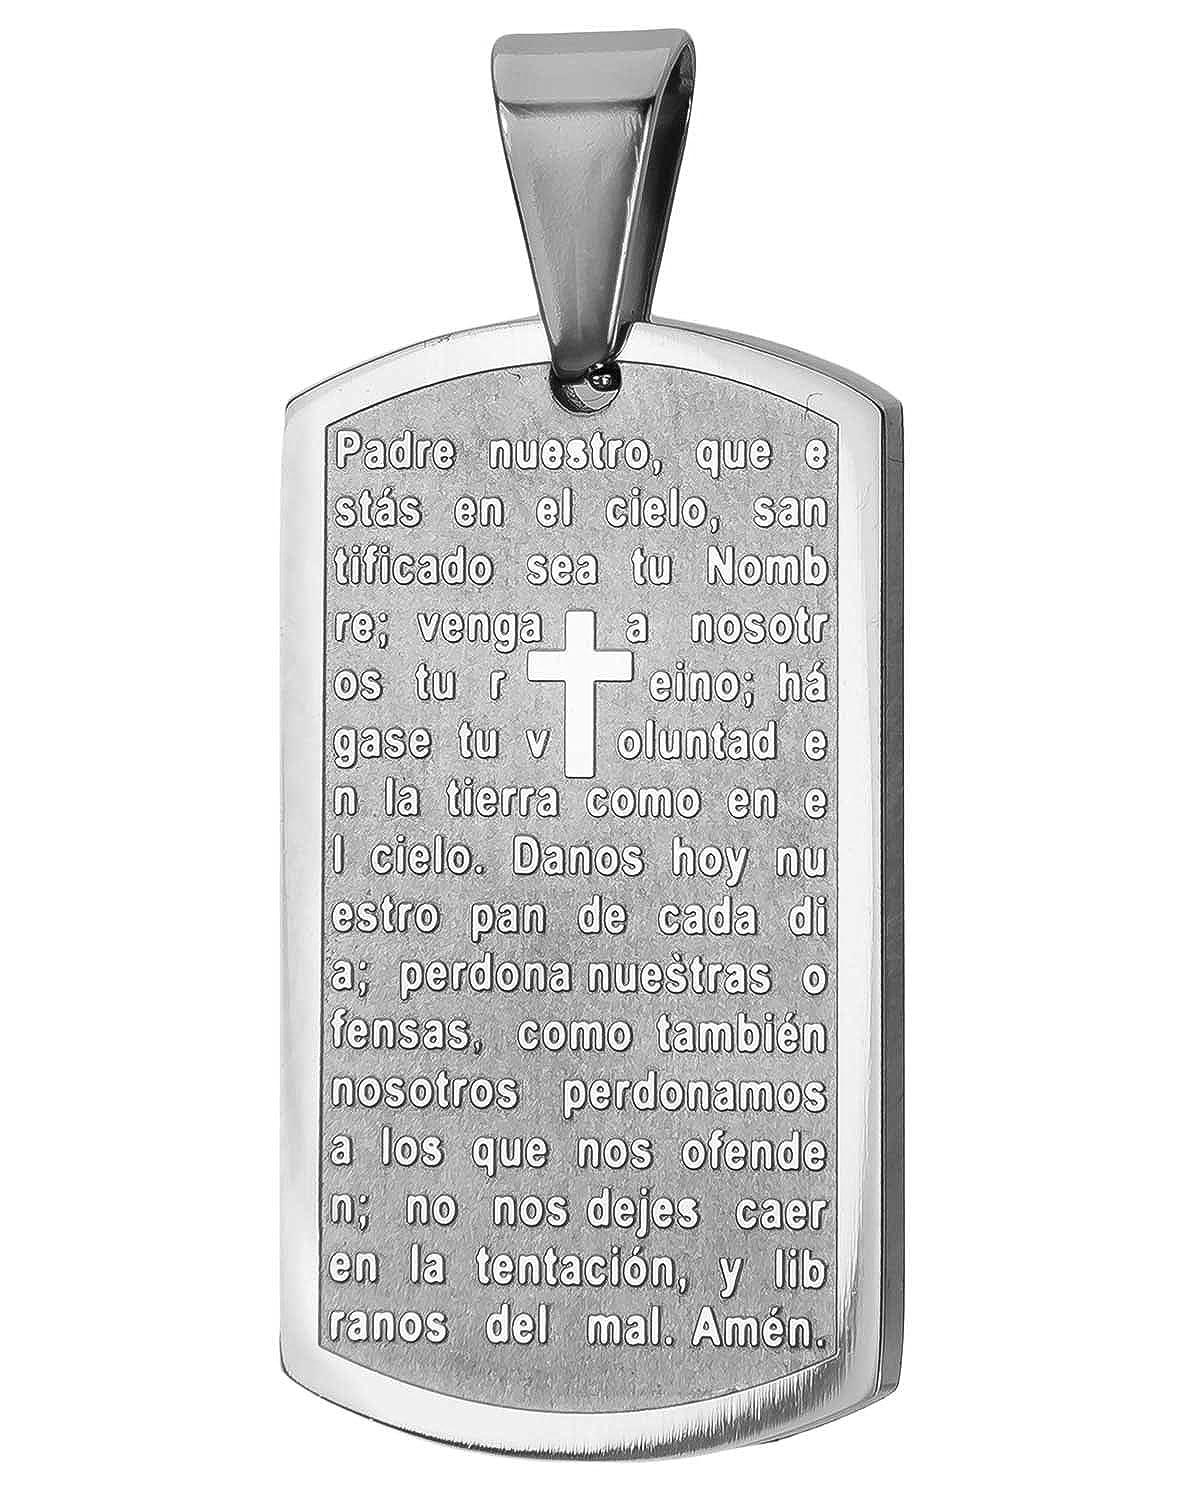 8c0ea414404bd CHRISTIAN/CATHOLIC STAINLESS STEEL DOG TAG, SPANISH PADRE NUESTRO ...